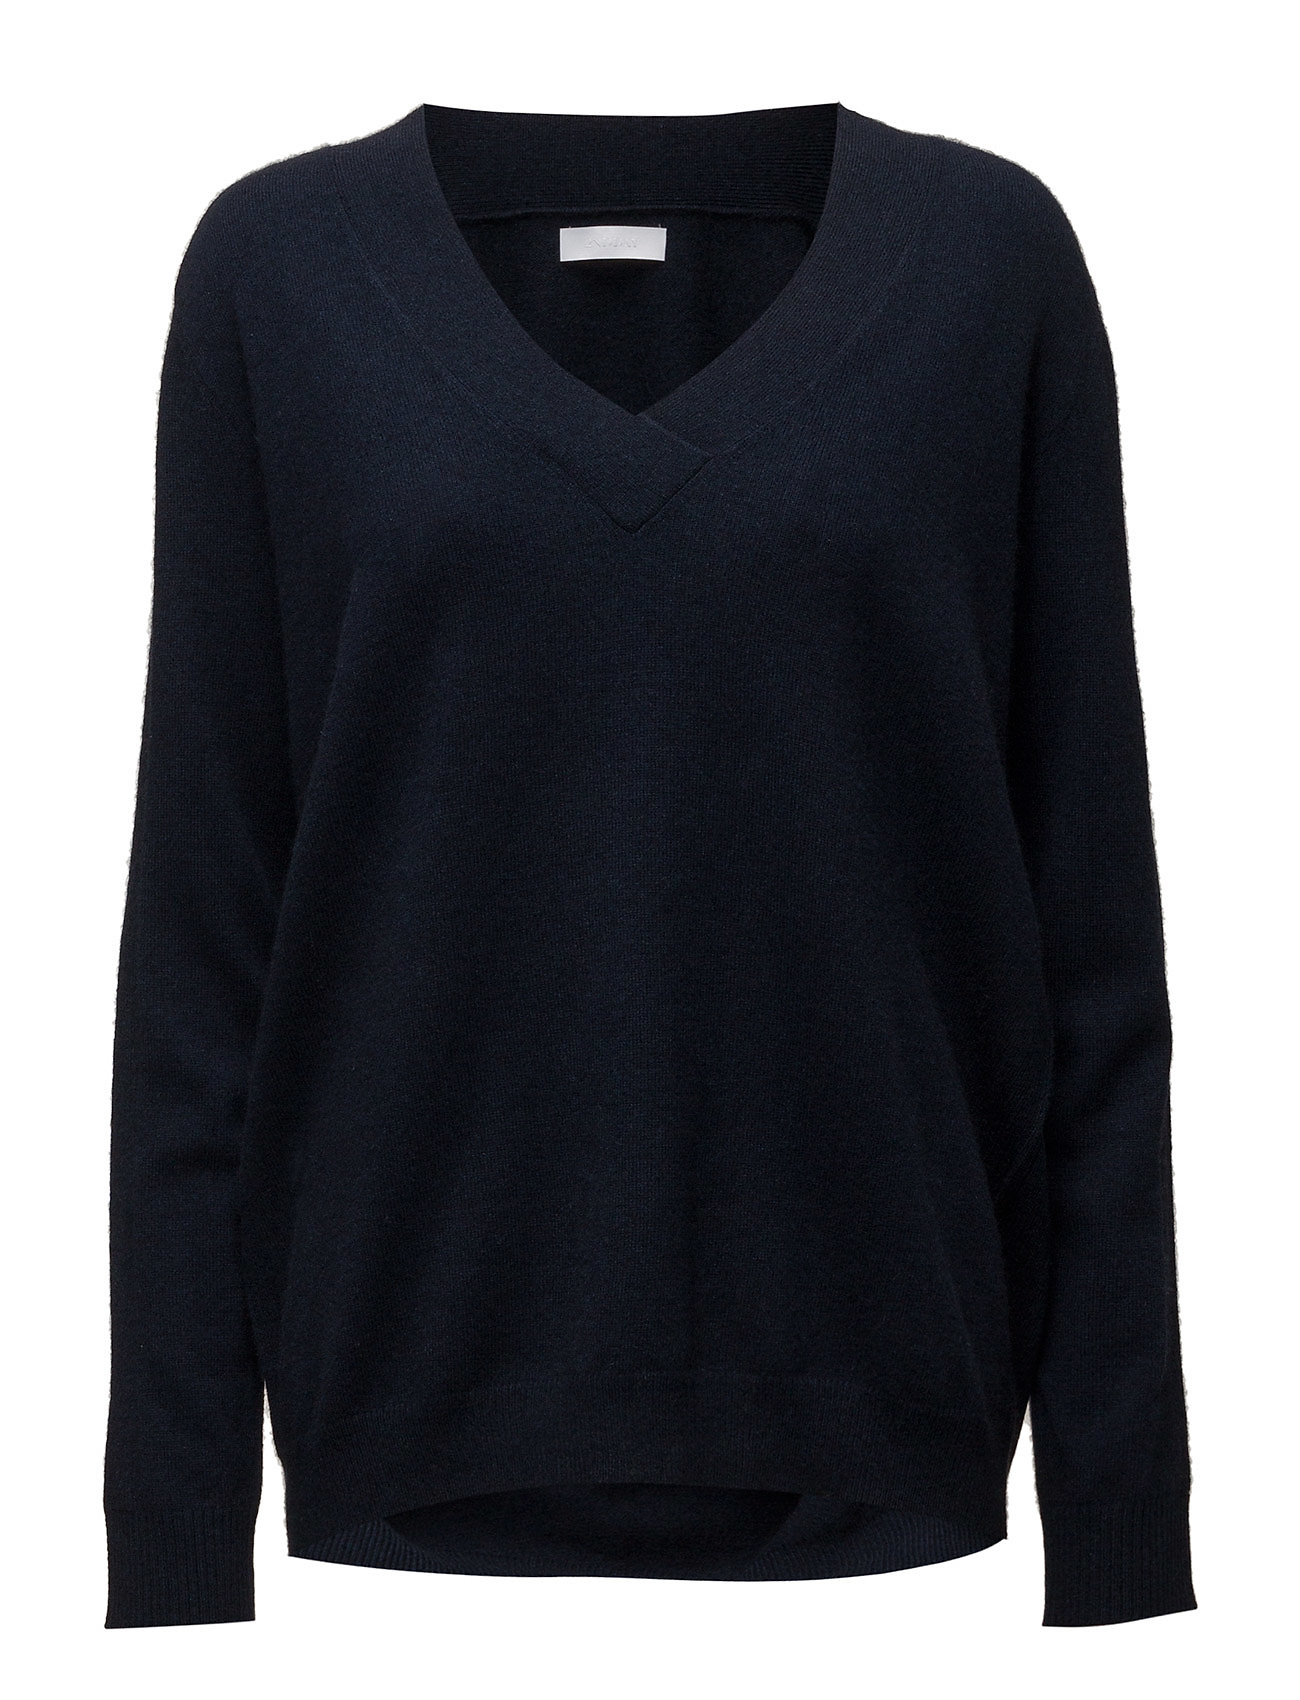 2nd Mila 2NDDAY Sweatshirts til Kvinder i Navy Blazer